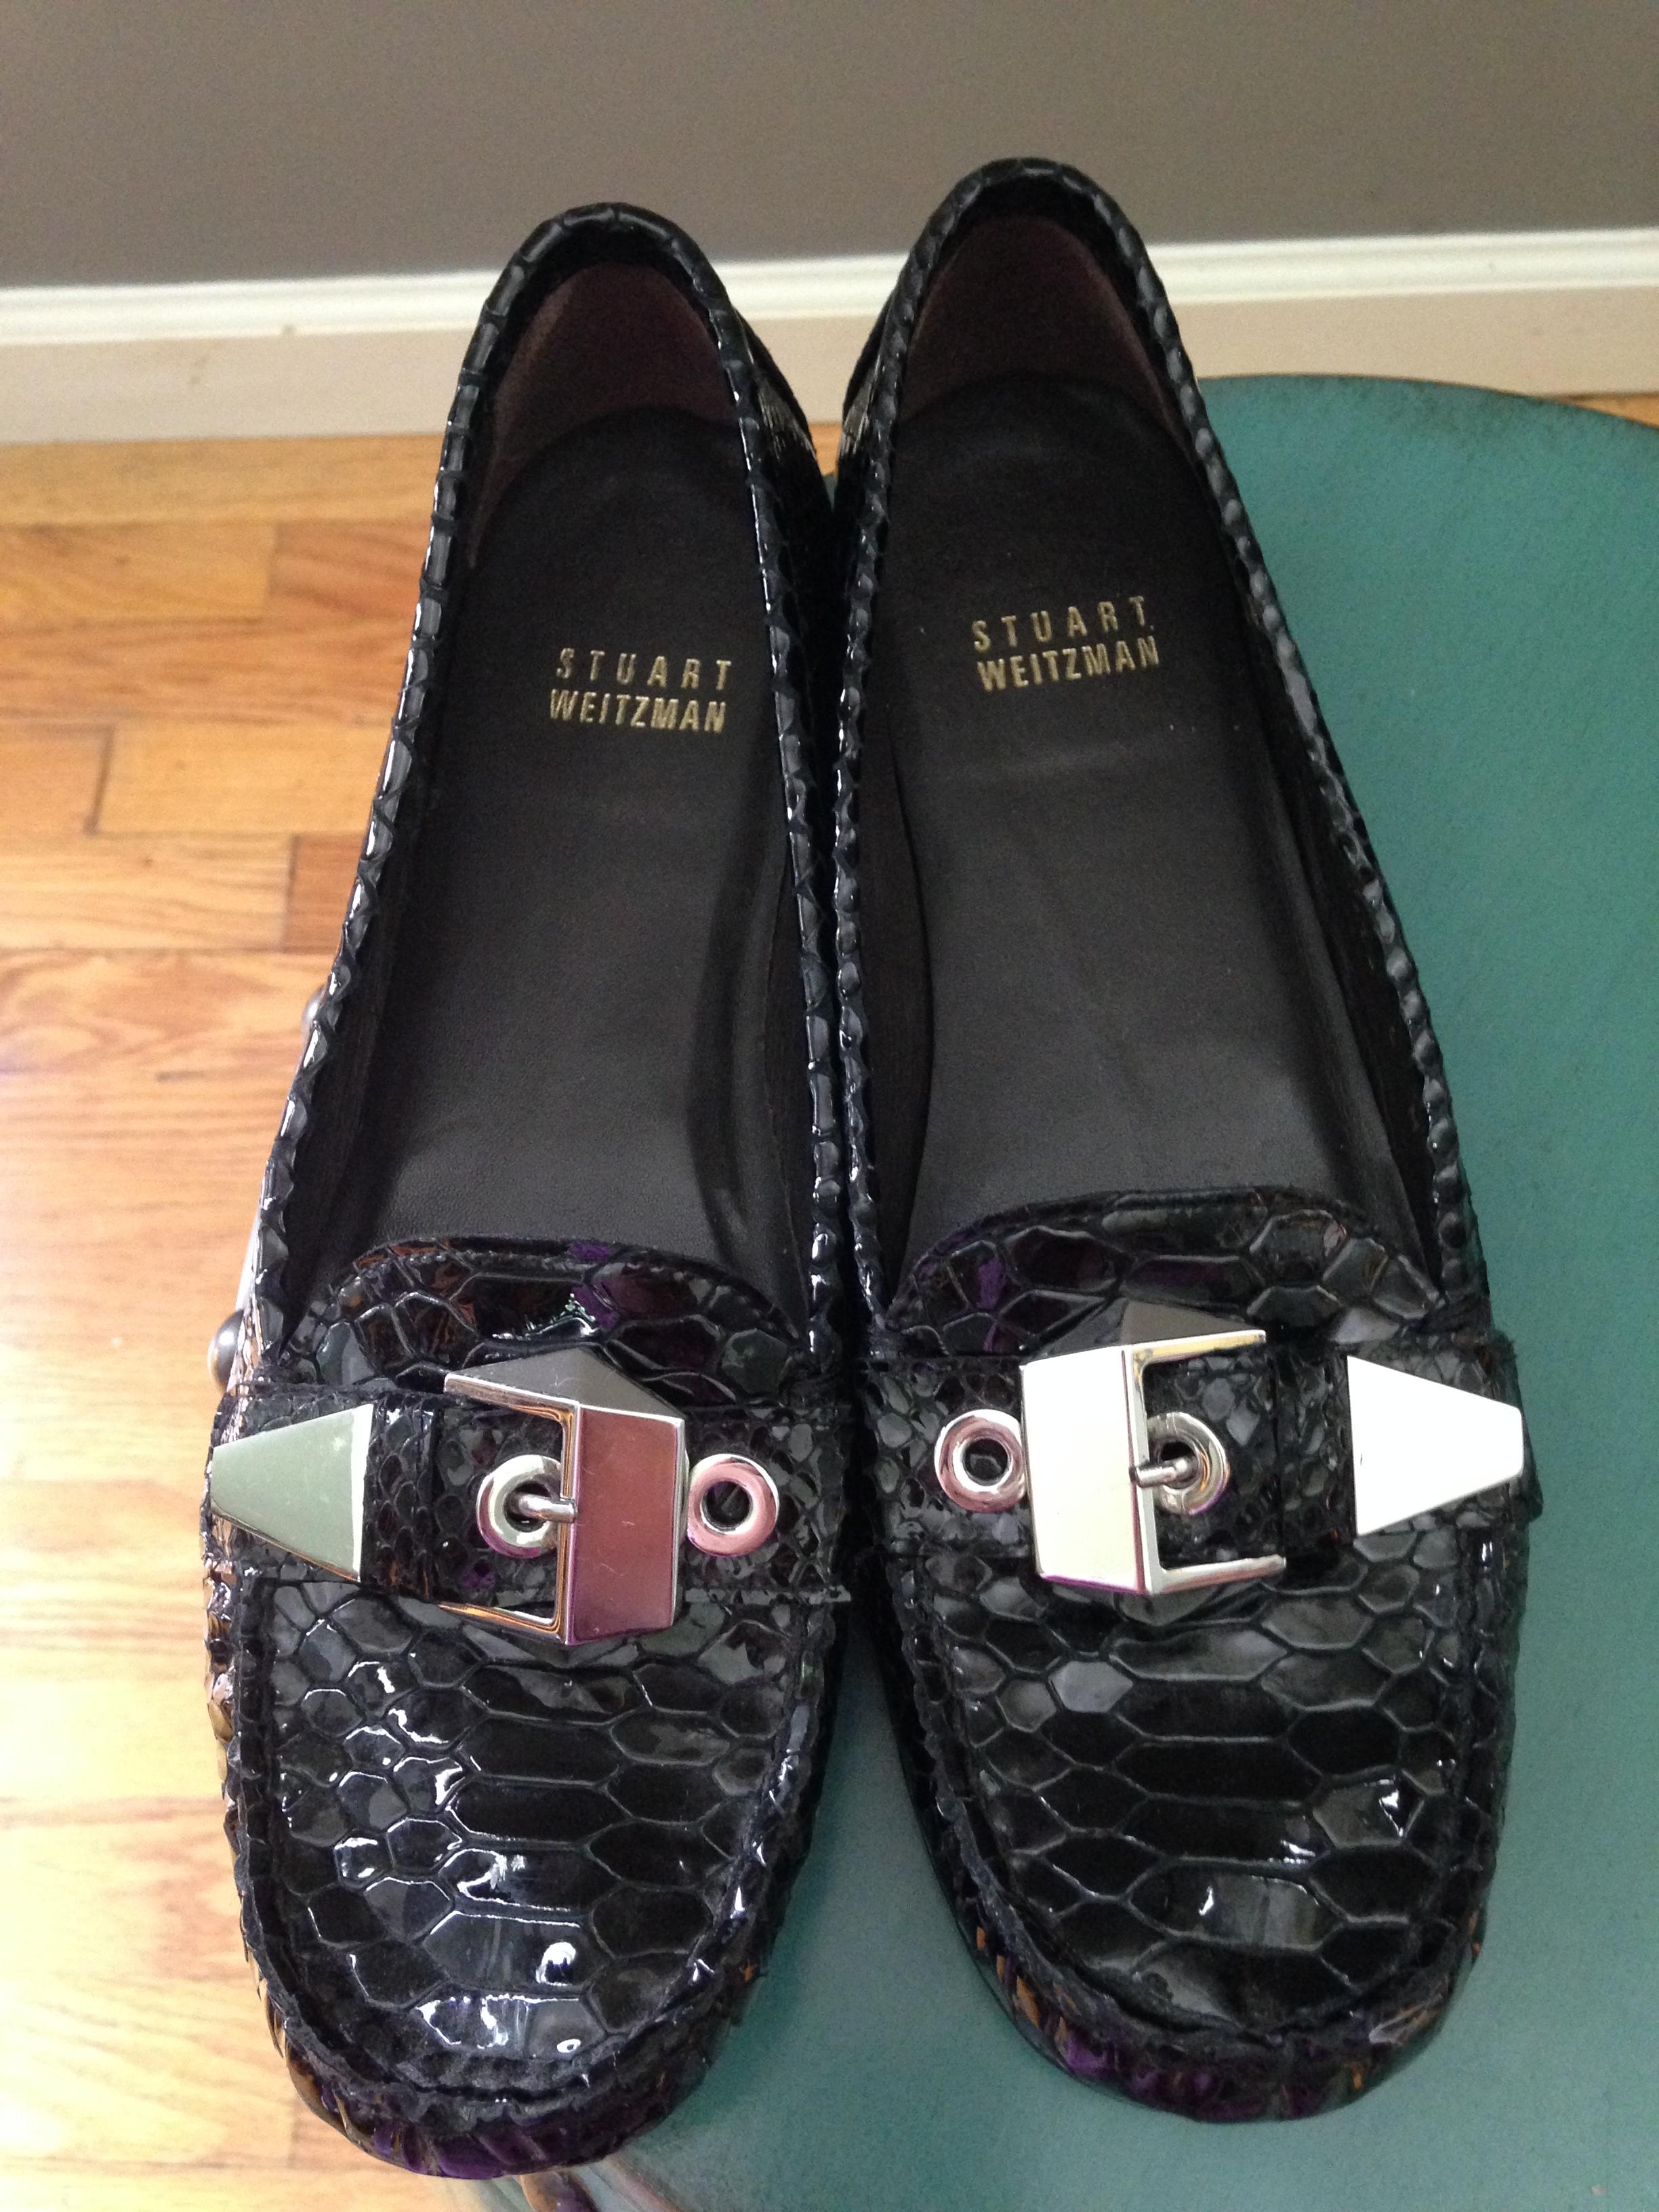 retro Stuart Weitzman black loafers